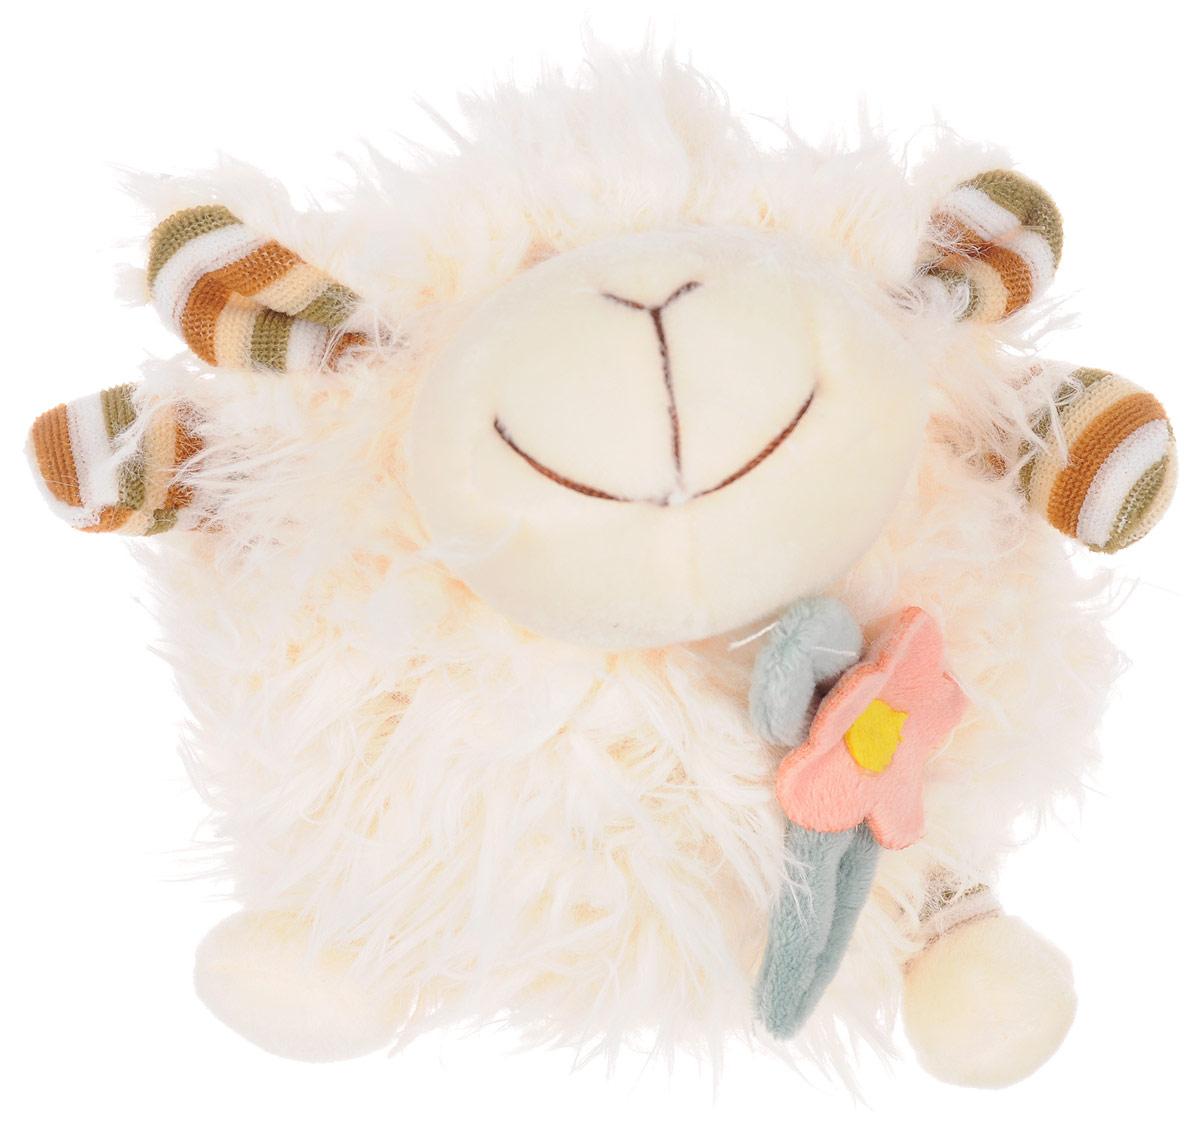 Jackie Chinoco Мягкая игрушка Овечка с бантом 16 см мягкая игрушка jackie chinoco петус джейси 13107 8 5